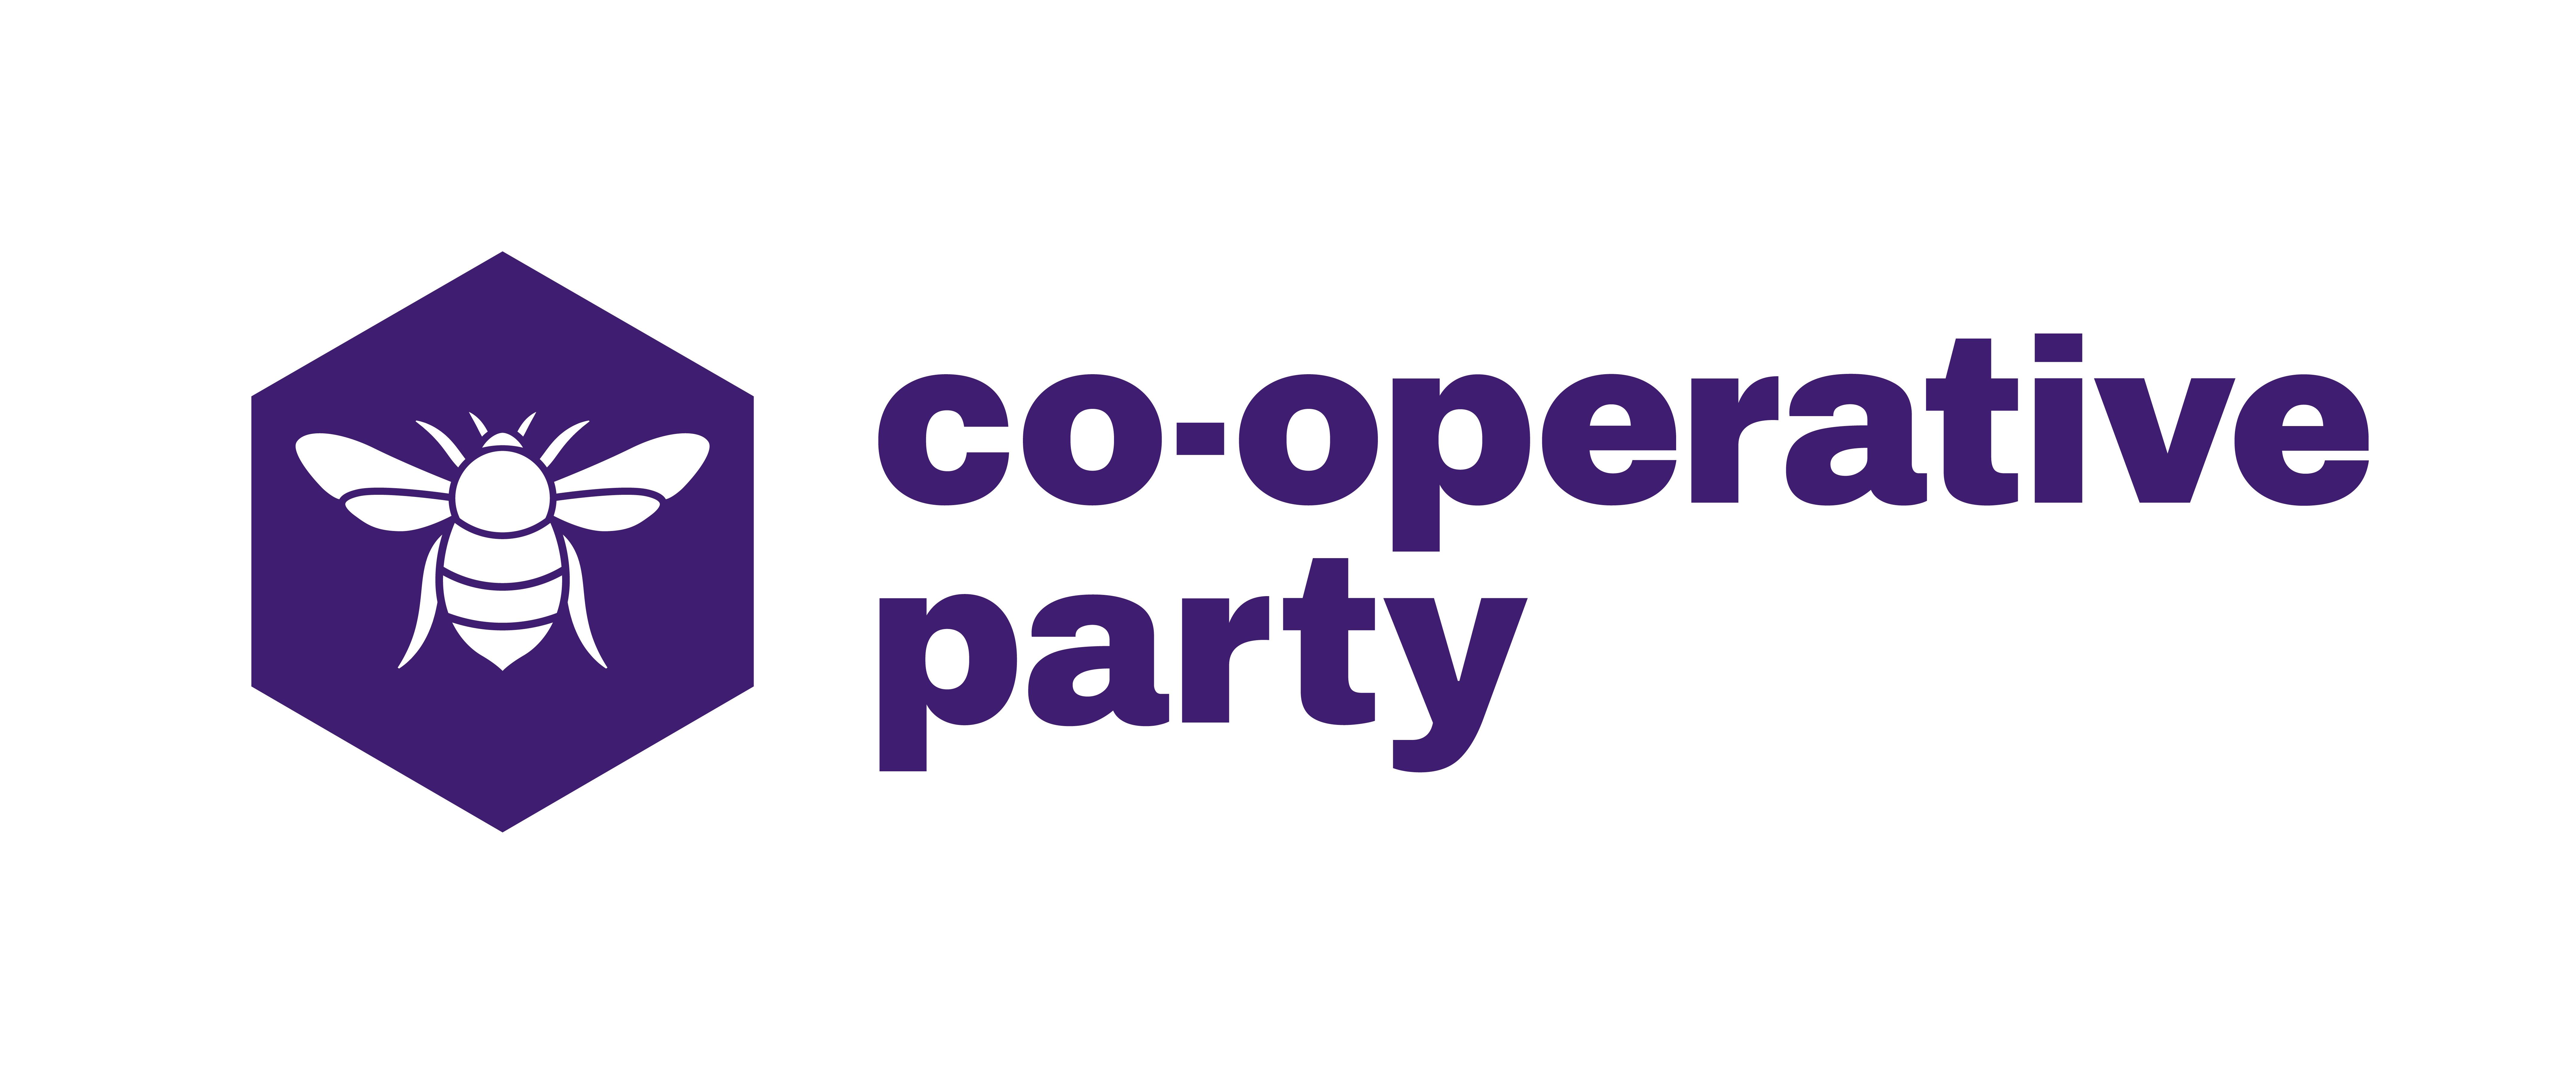 Co-operative Party Ltd: AGM 2020